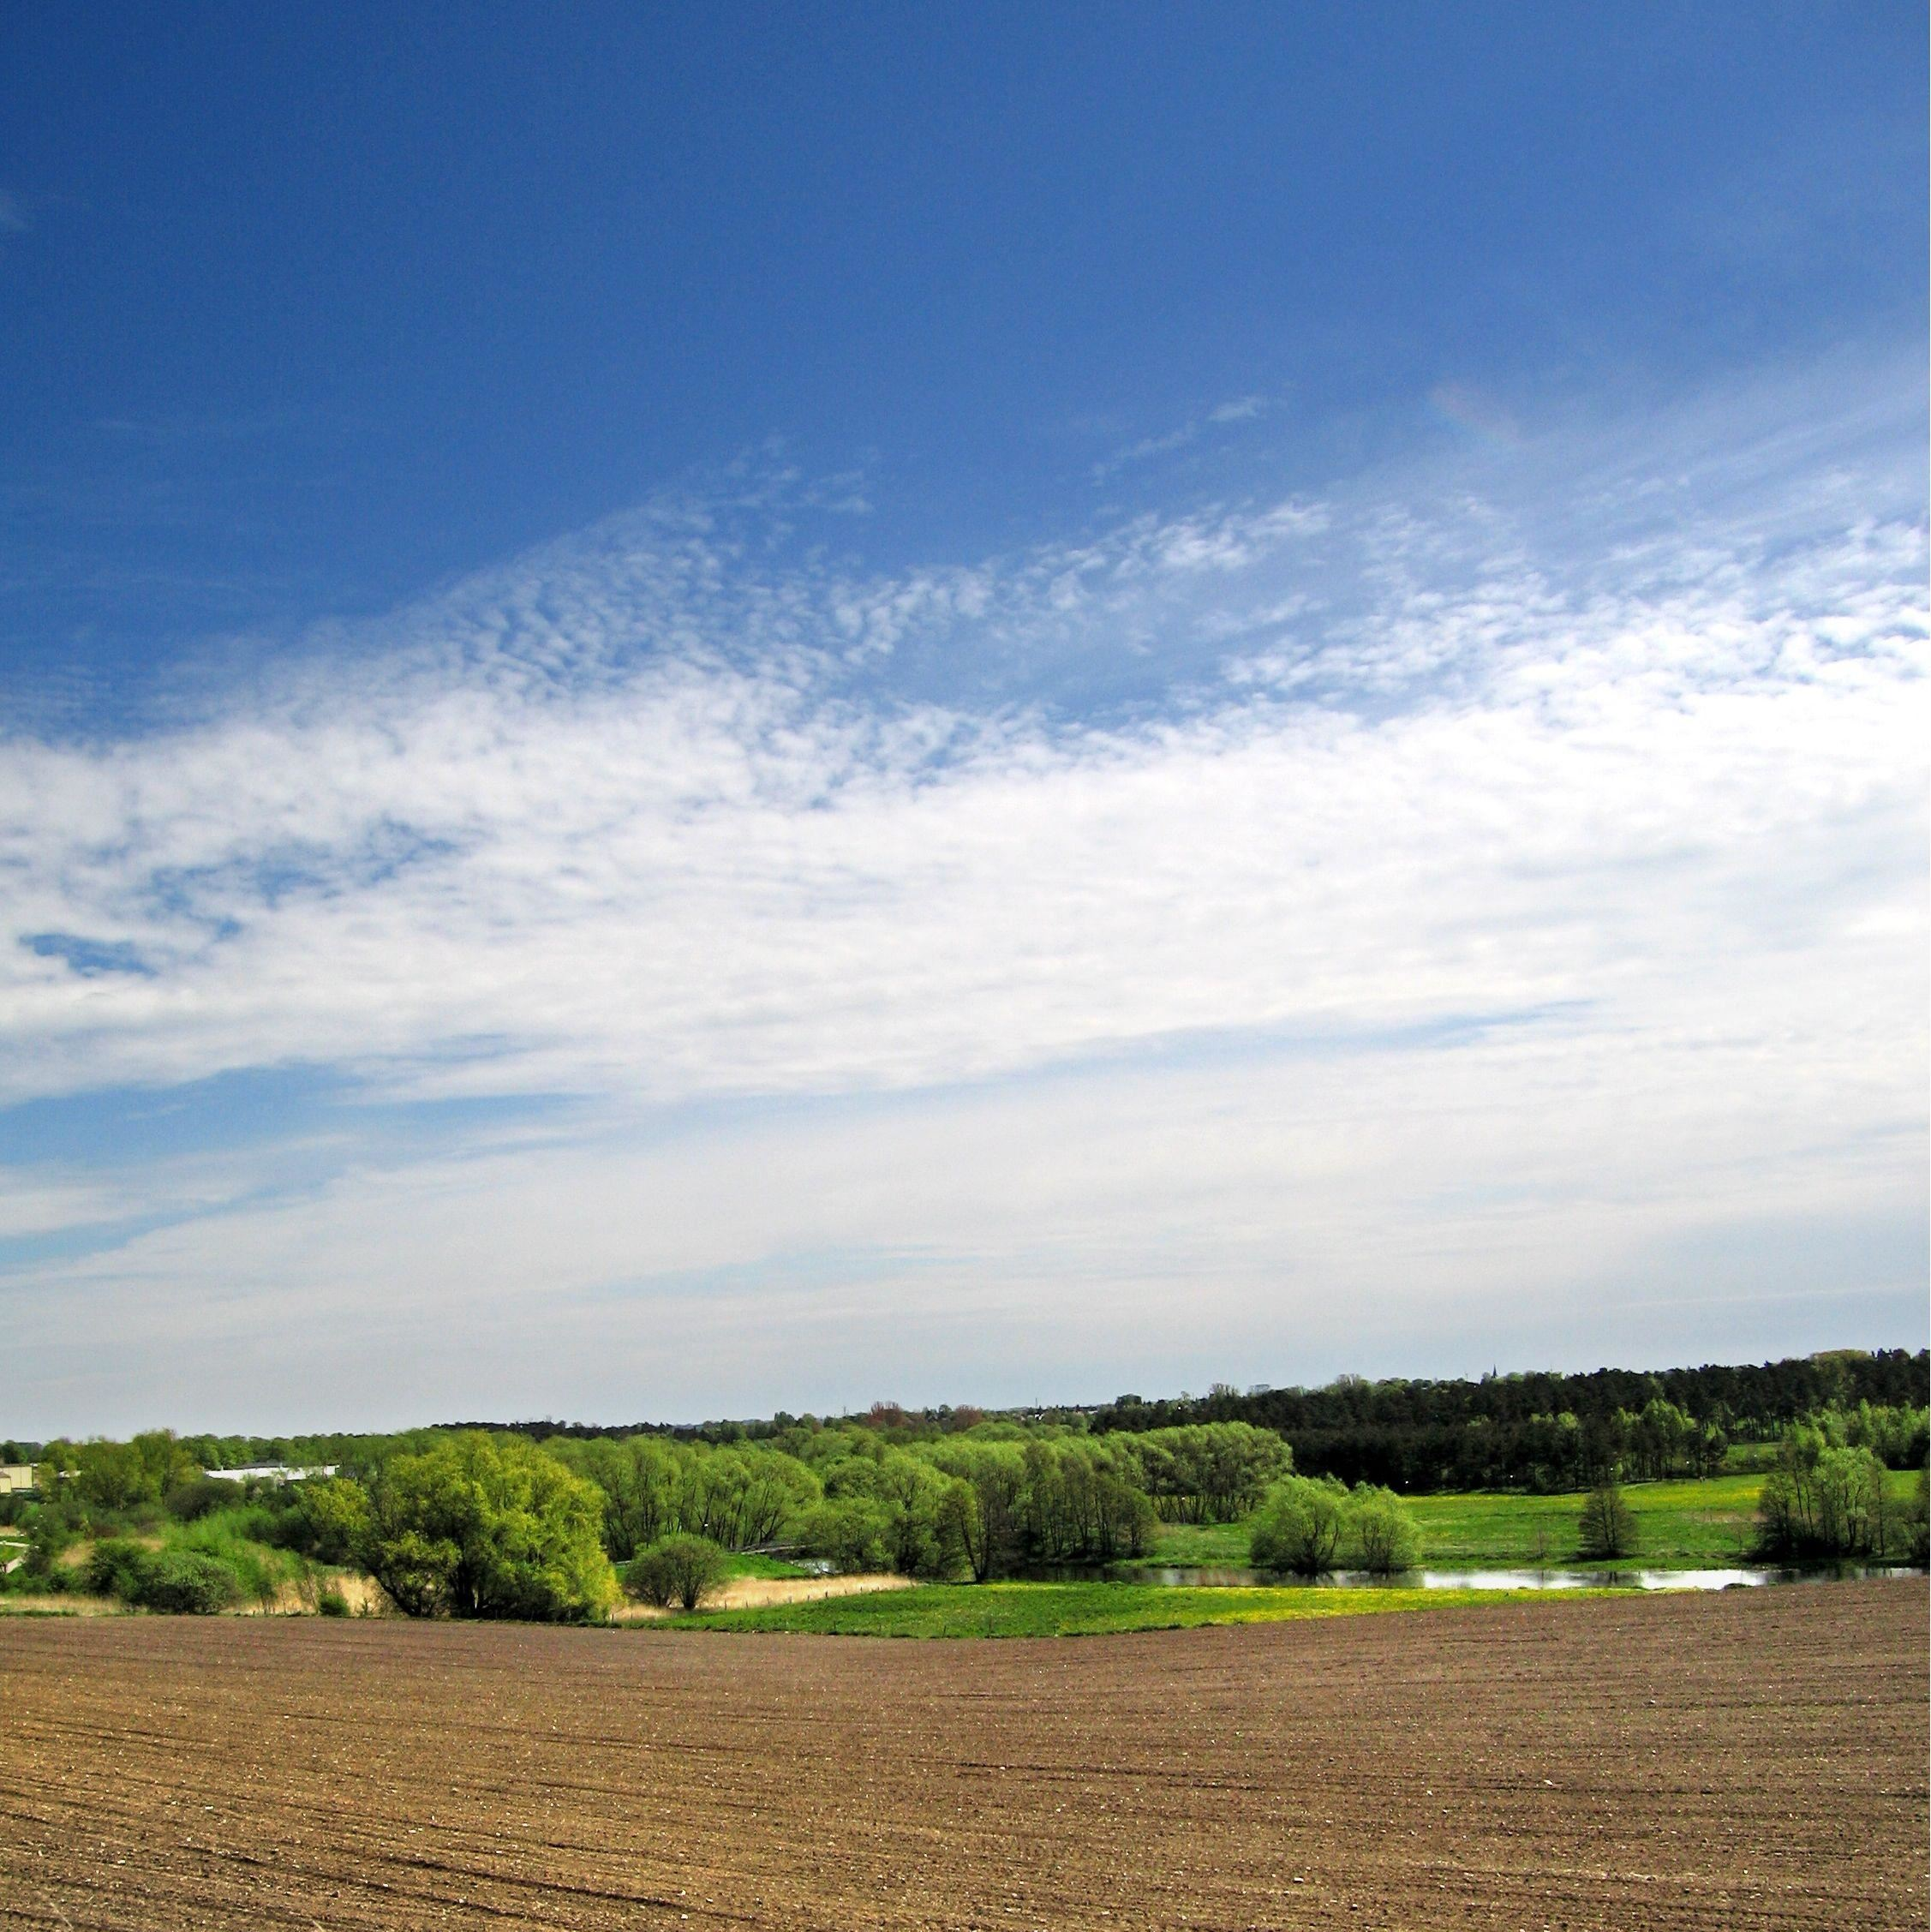 © Kävlinge kommun, Viken area in Furulund